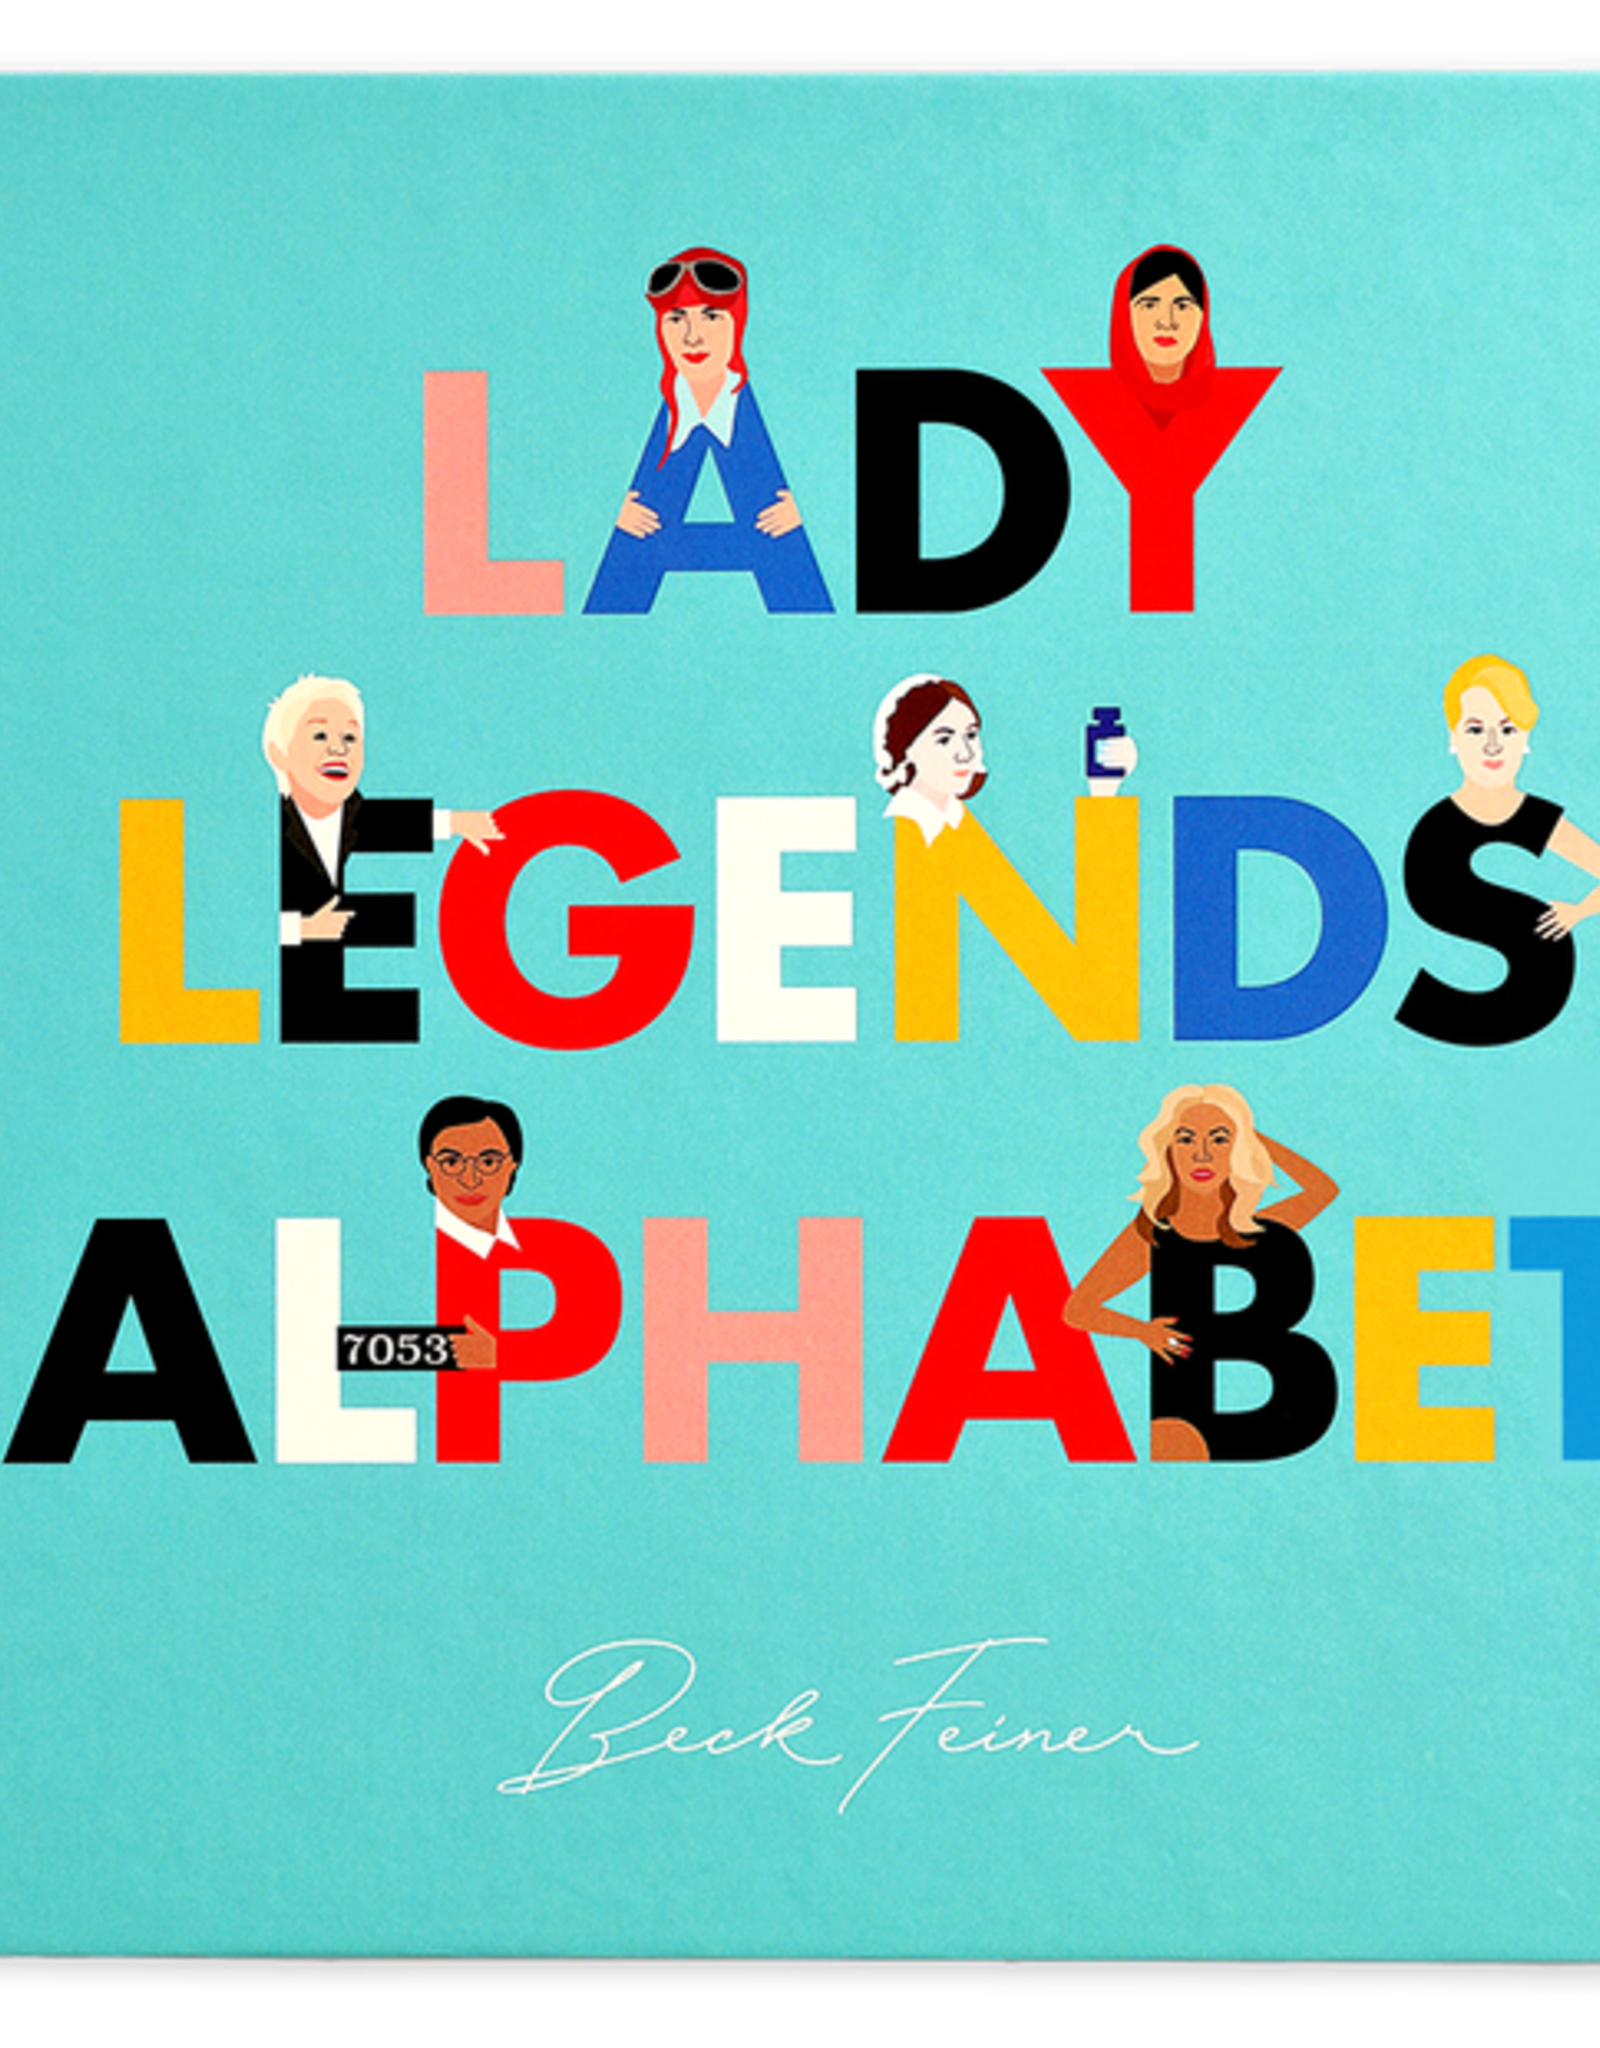 Alphabet Legends Alphabet Book - Lady Legends